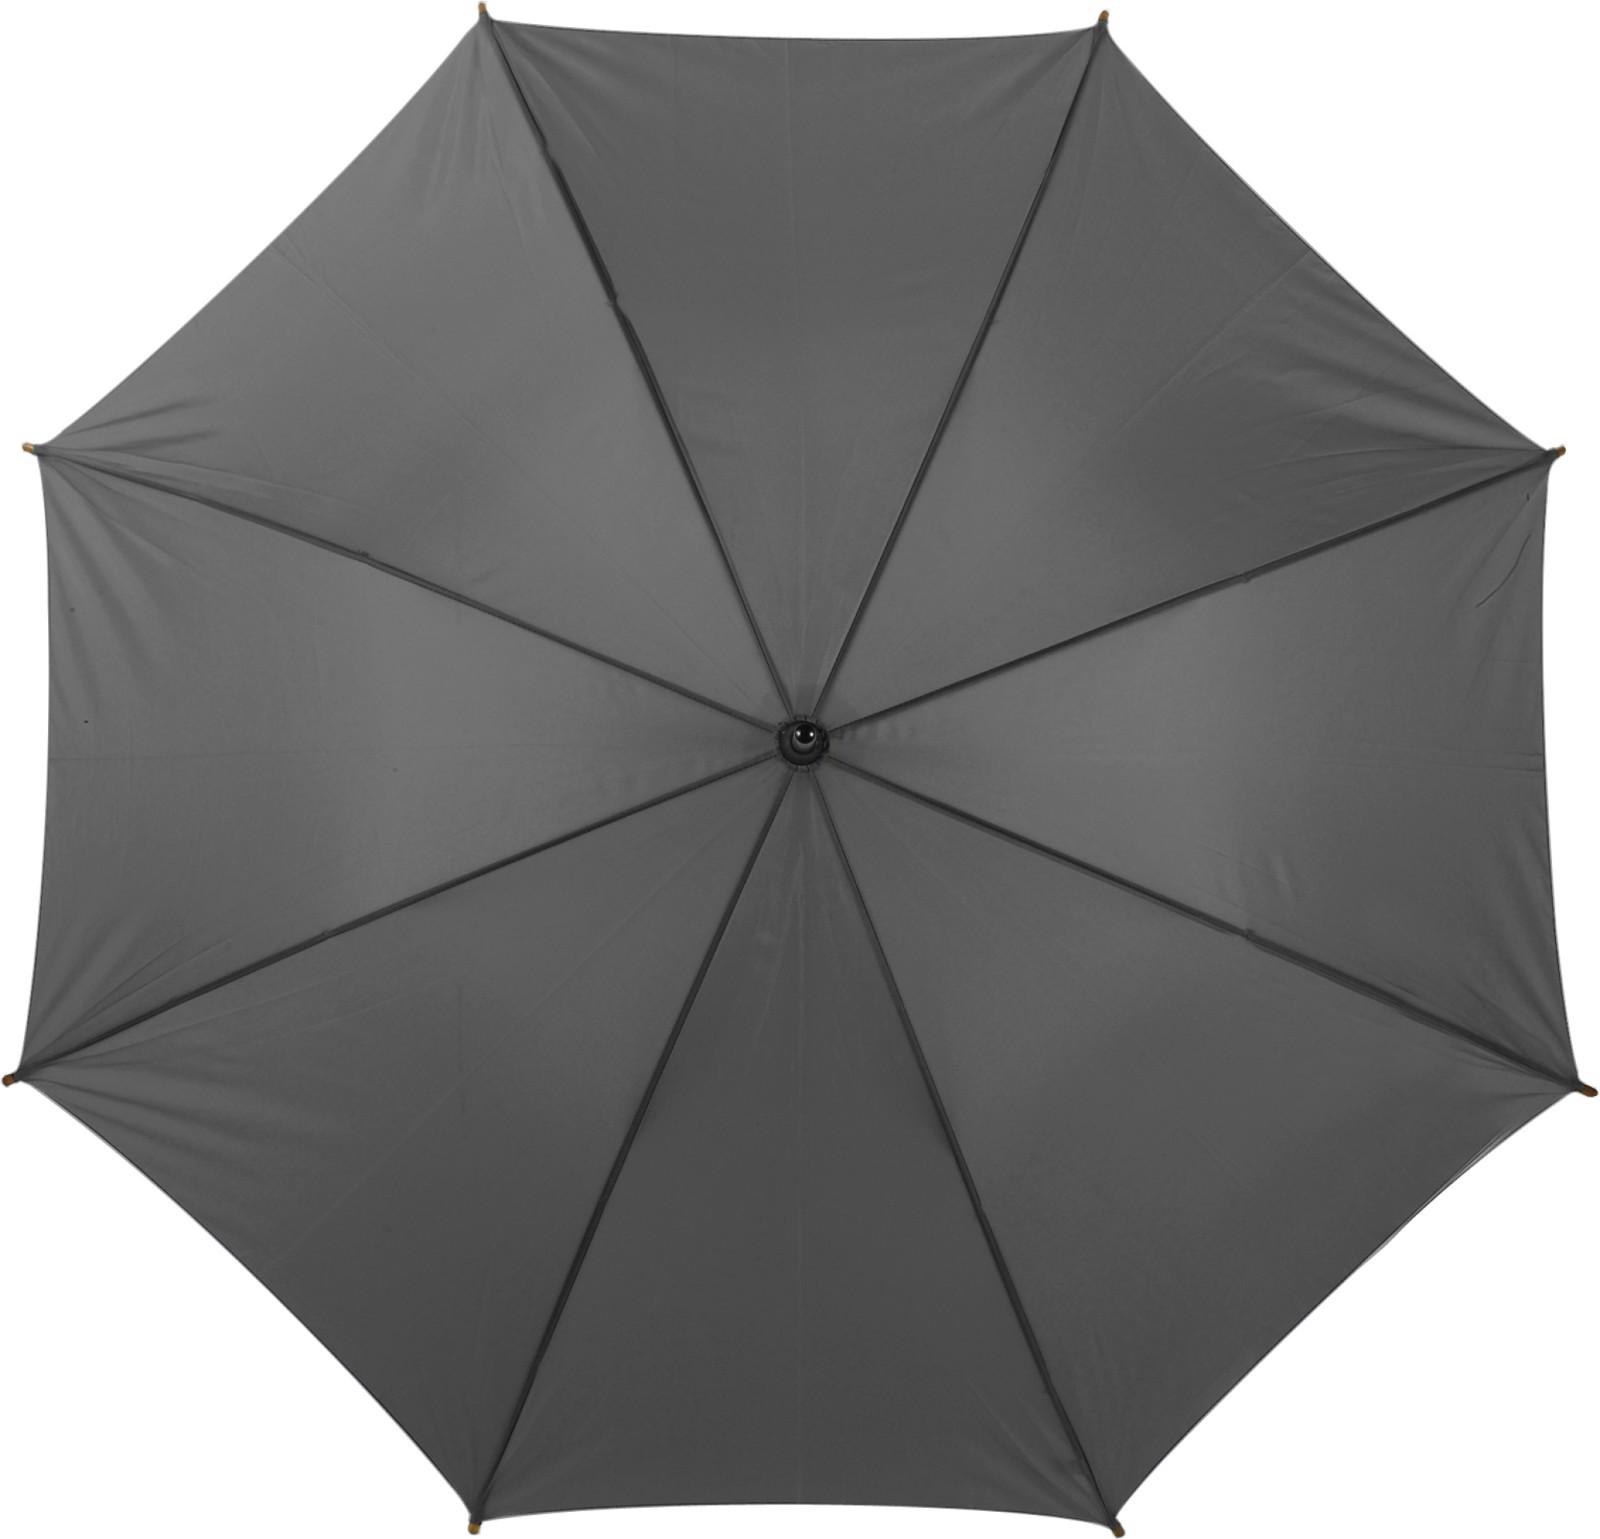 Polyester (190T) umbrella - Grey